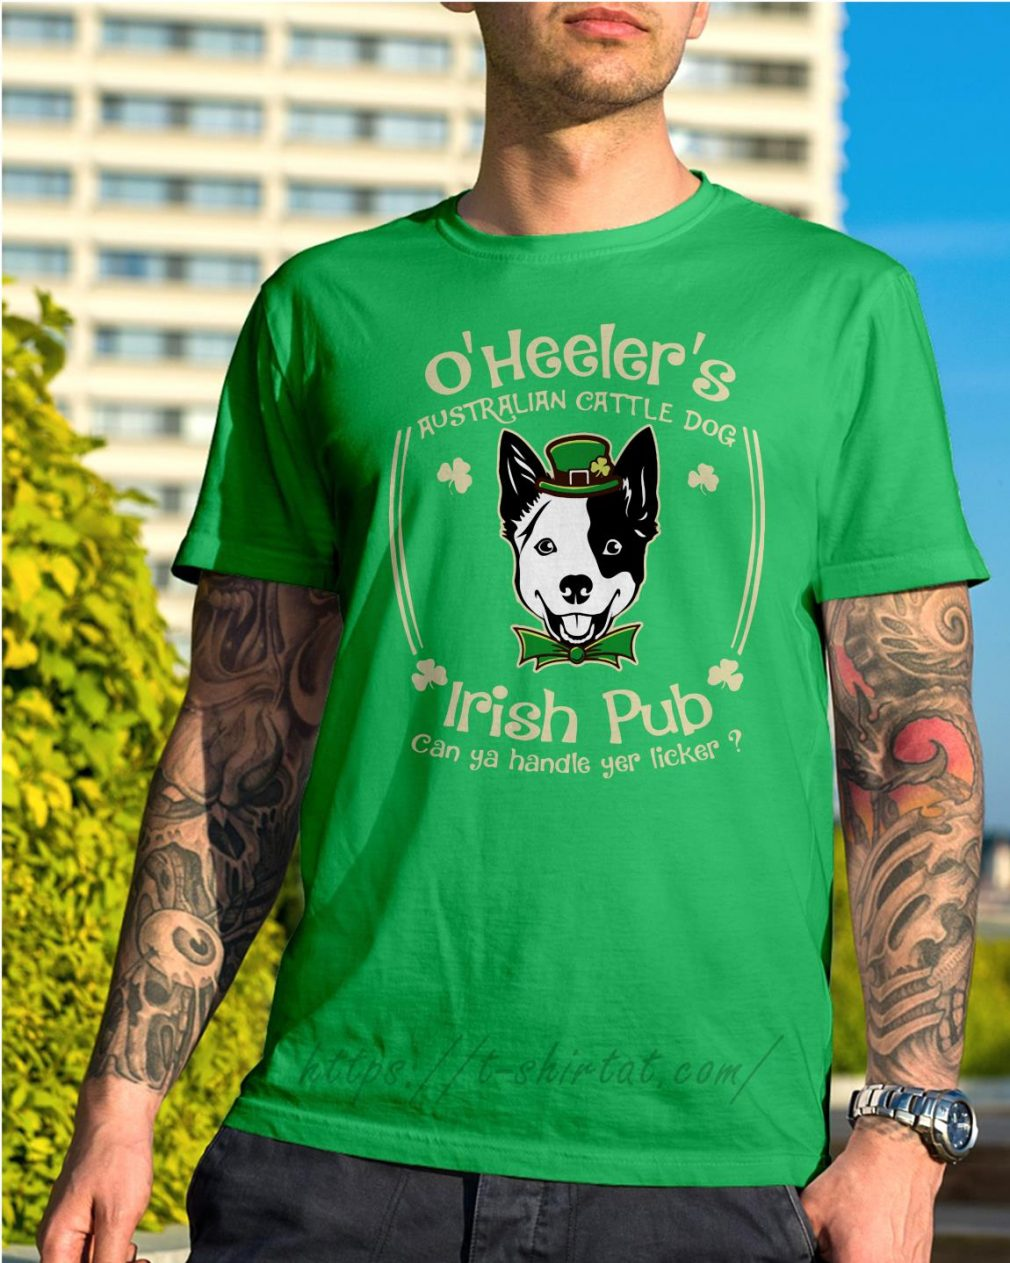 St Patrick's day O' Heelers Australian cattle dog Irish Pub Shirt green